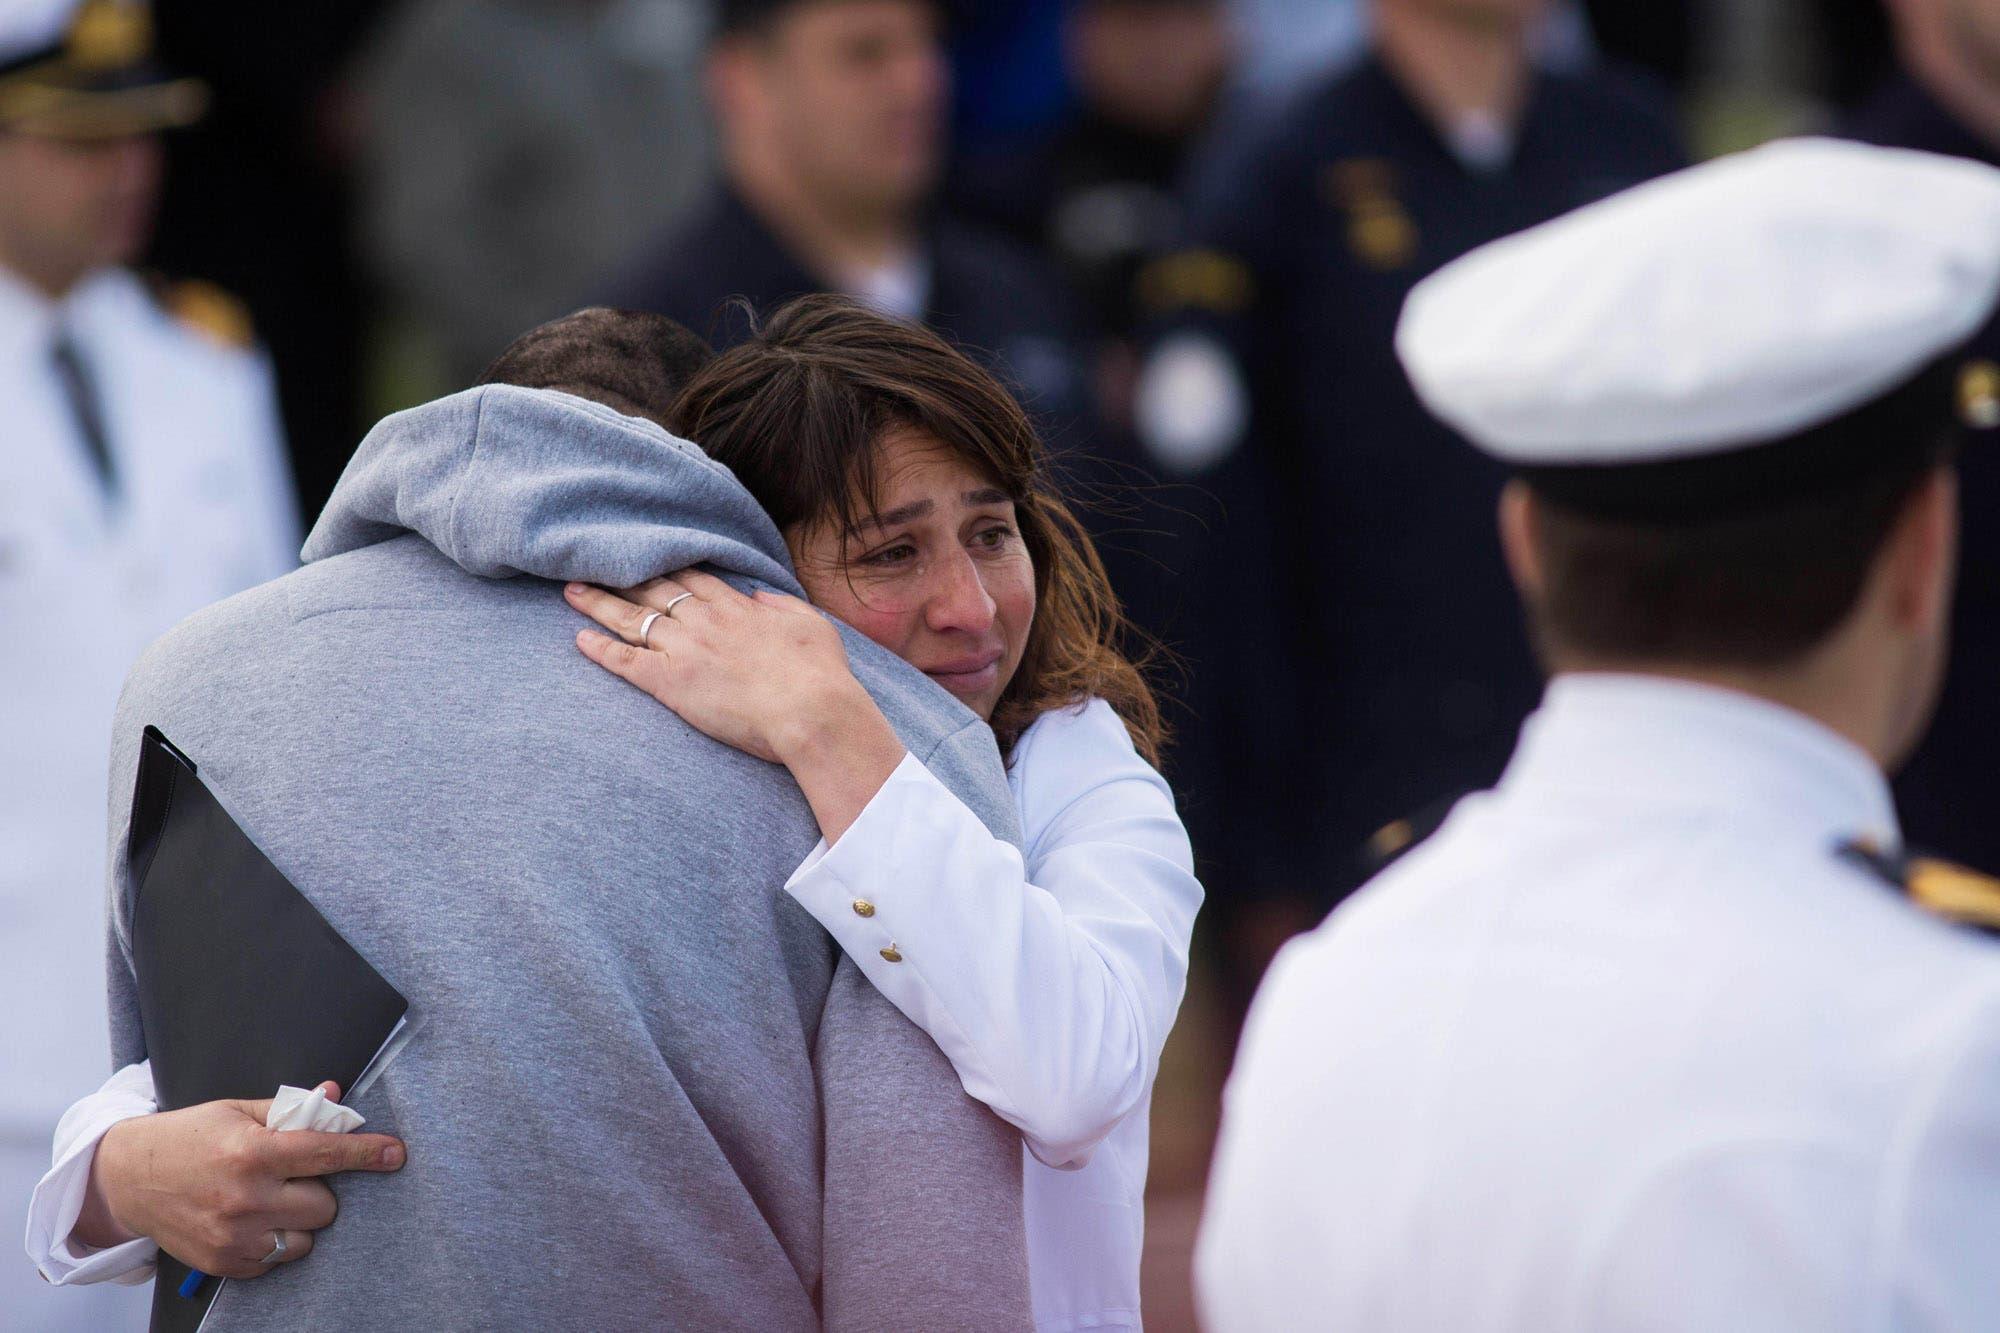 Familiares de los tripulantes del ARA San Juan criticaron el discurso de Macri